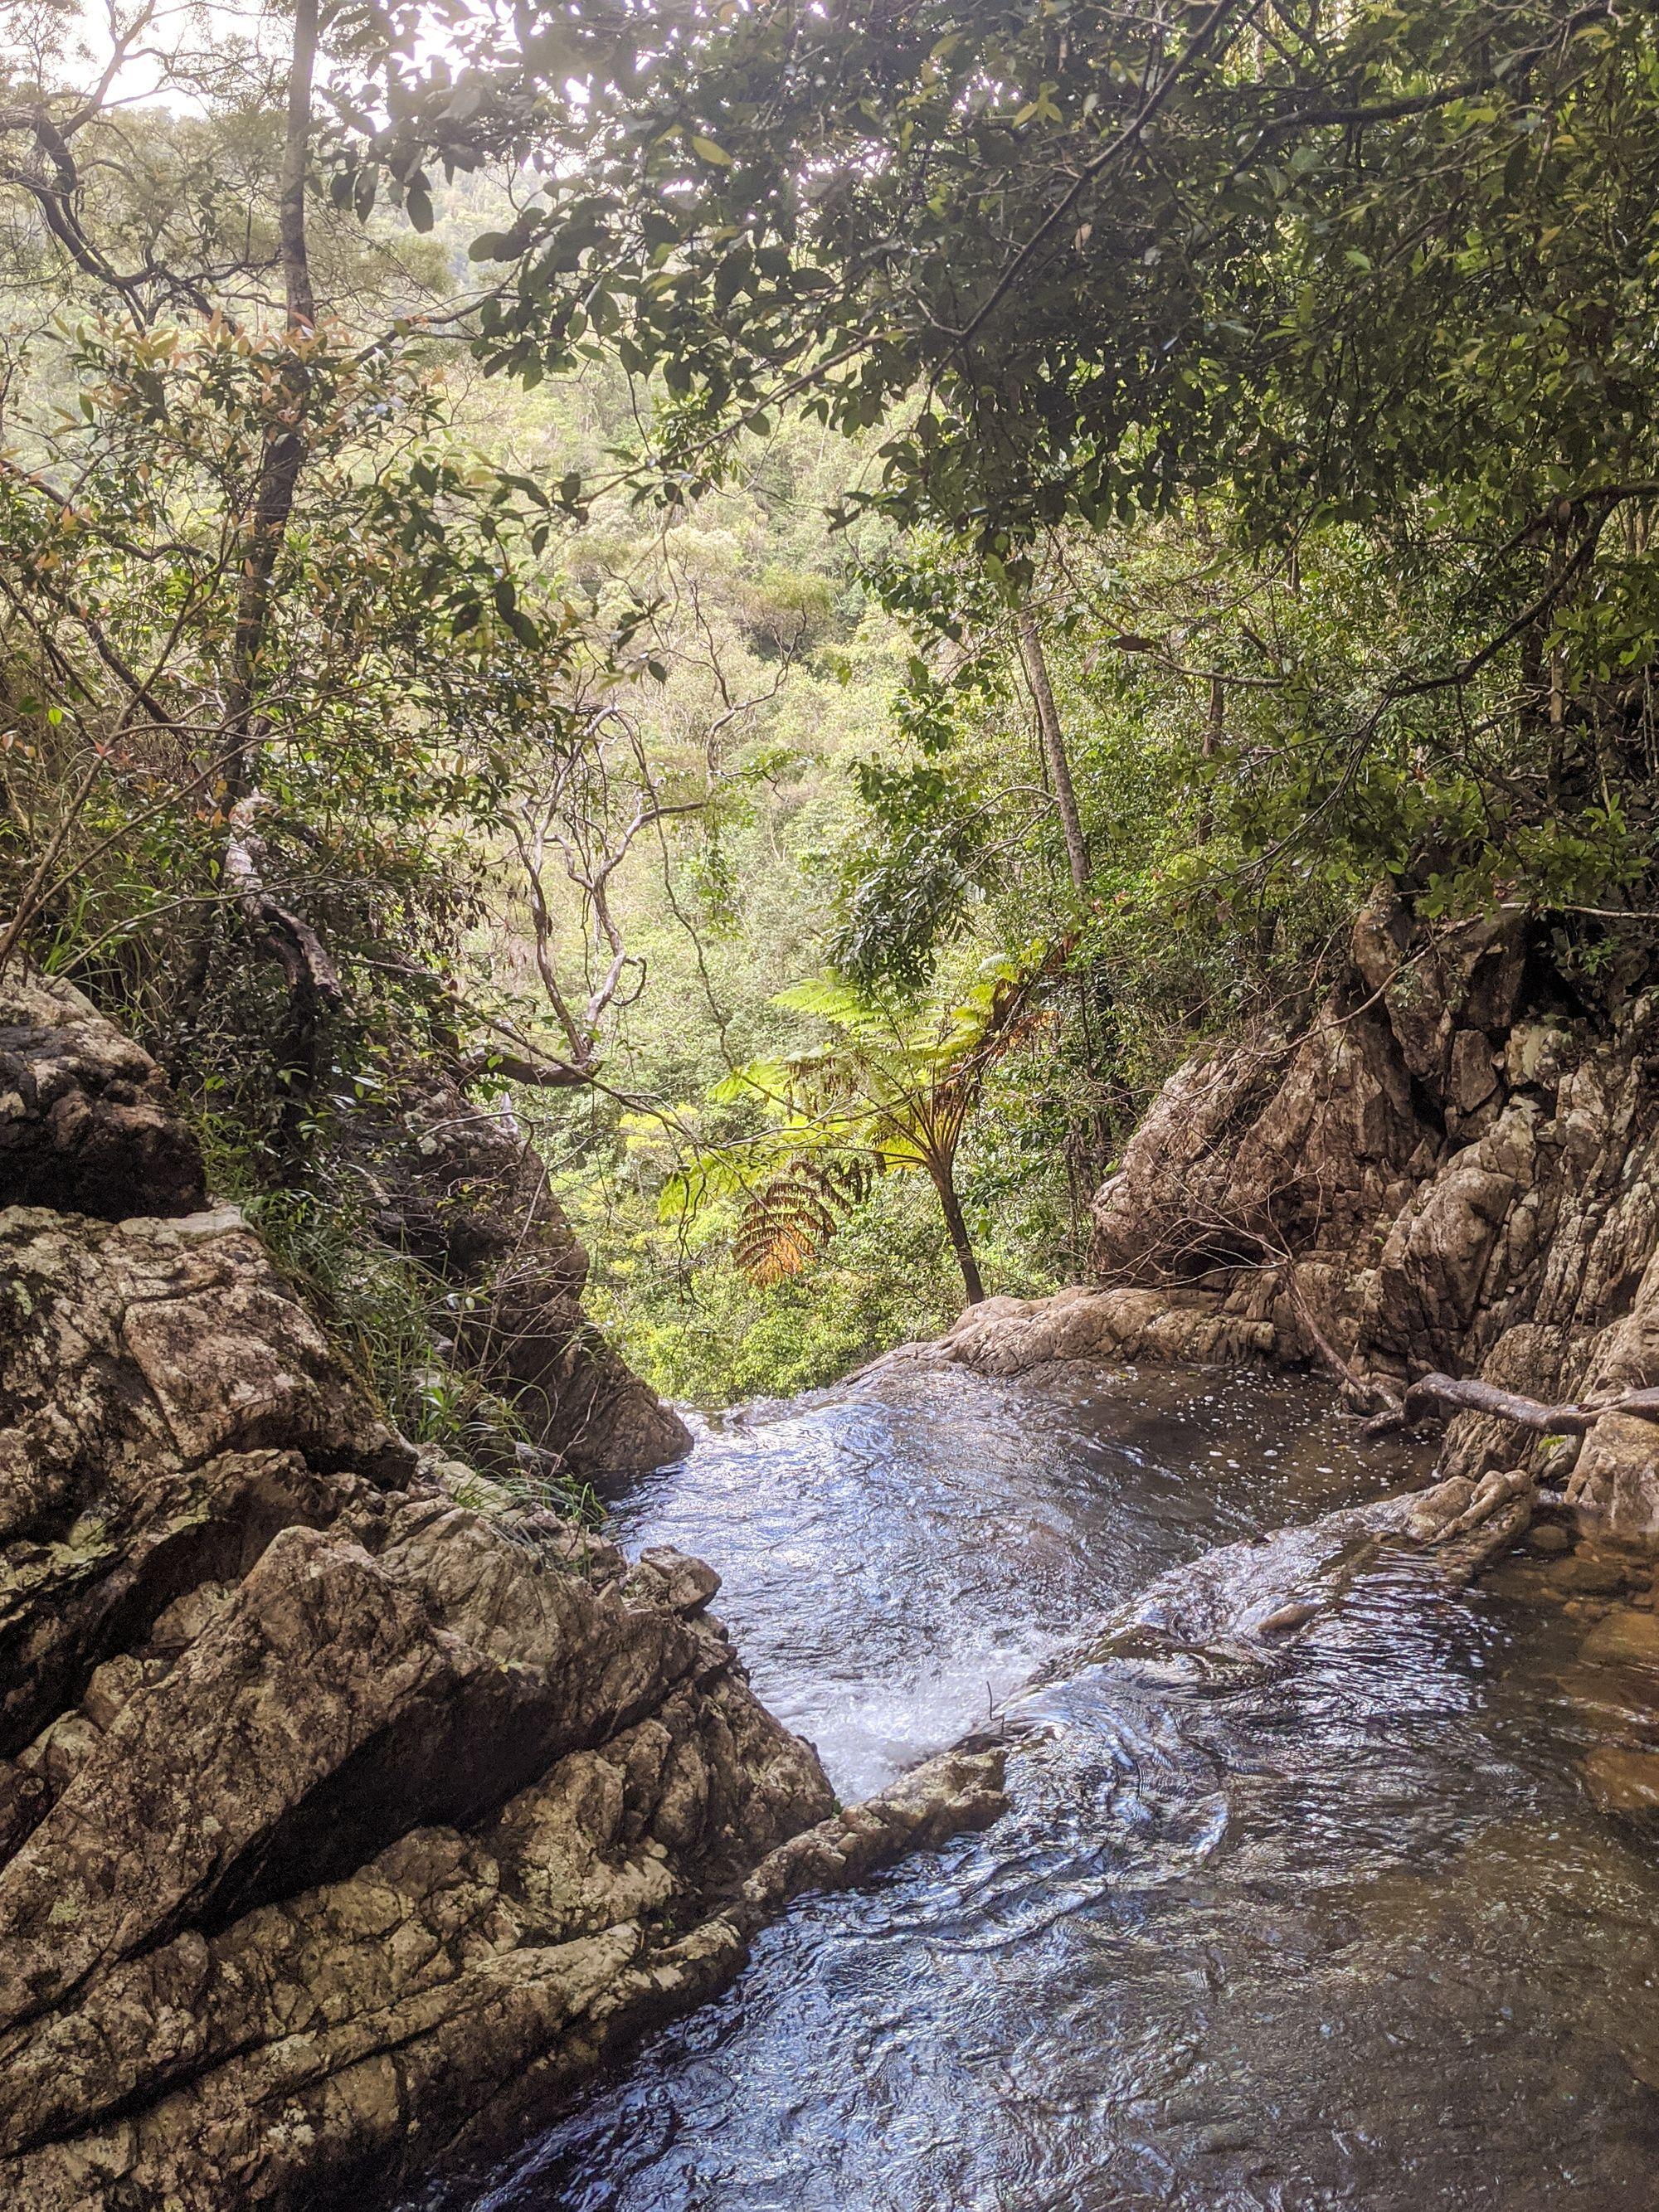 mobile creek drops